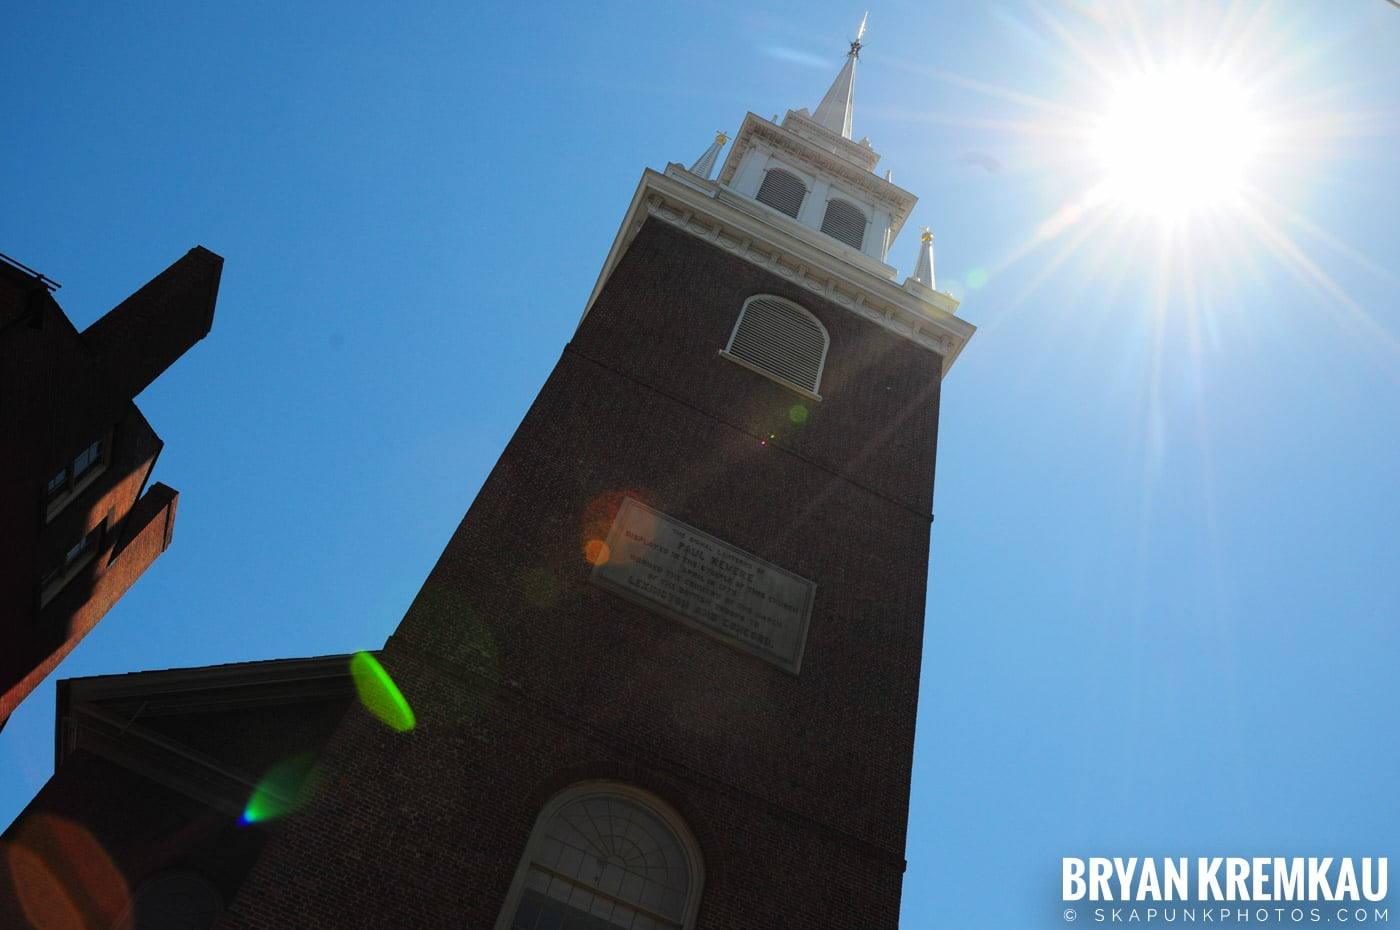 Memorial Day Weekend Trip to Boston - 5.25.08 (15)